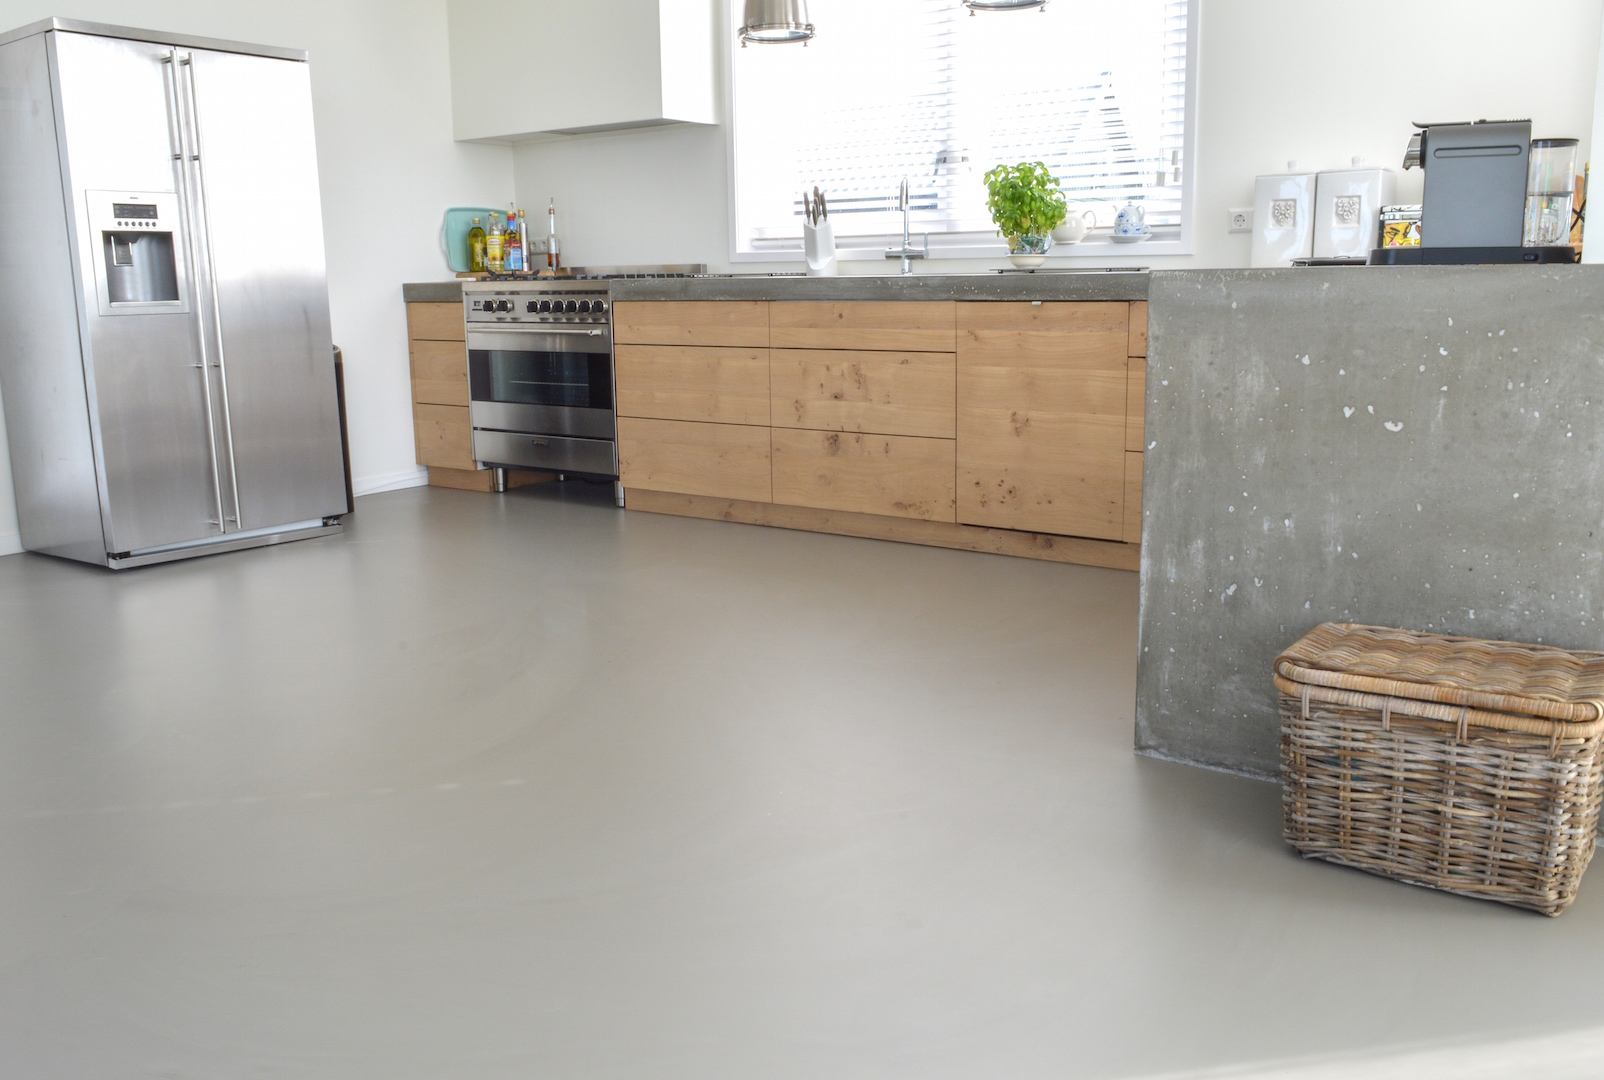 Gietvloer inspiratie livelovehome - Foto grijze keuken en hout ...